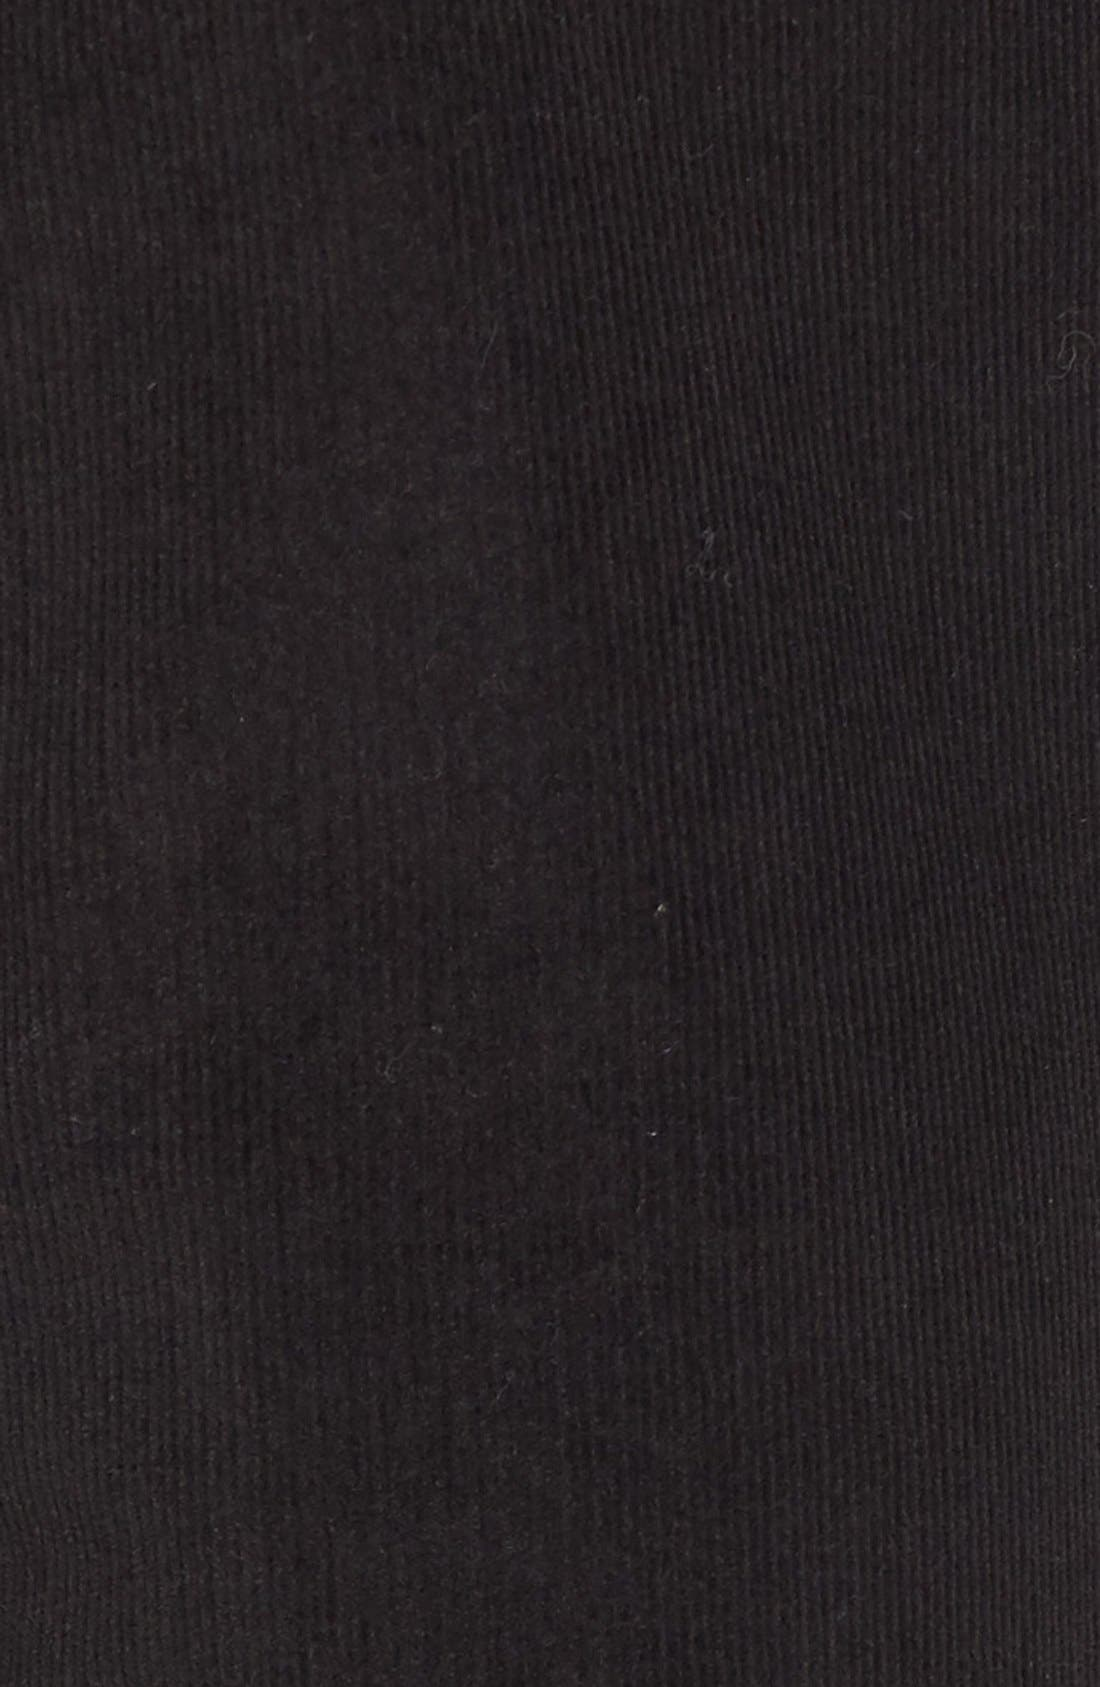 'Alina' Skinny Stretch Corduroy Pants,                             Alternate thumbnail 5, color,                             001